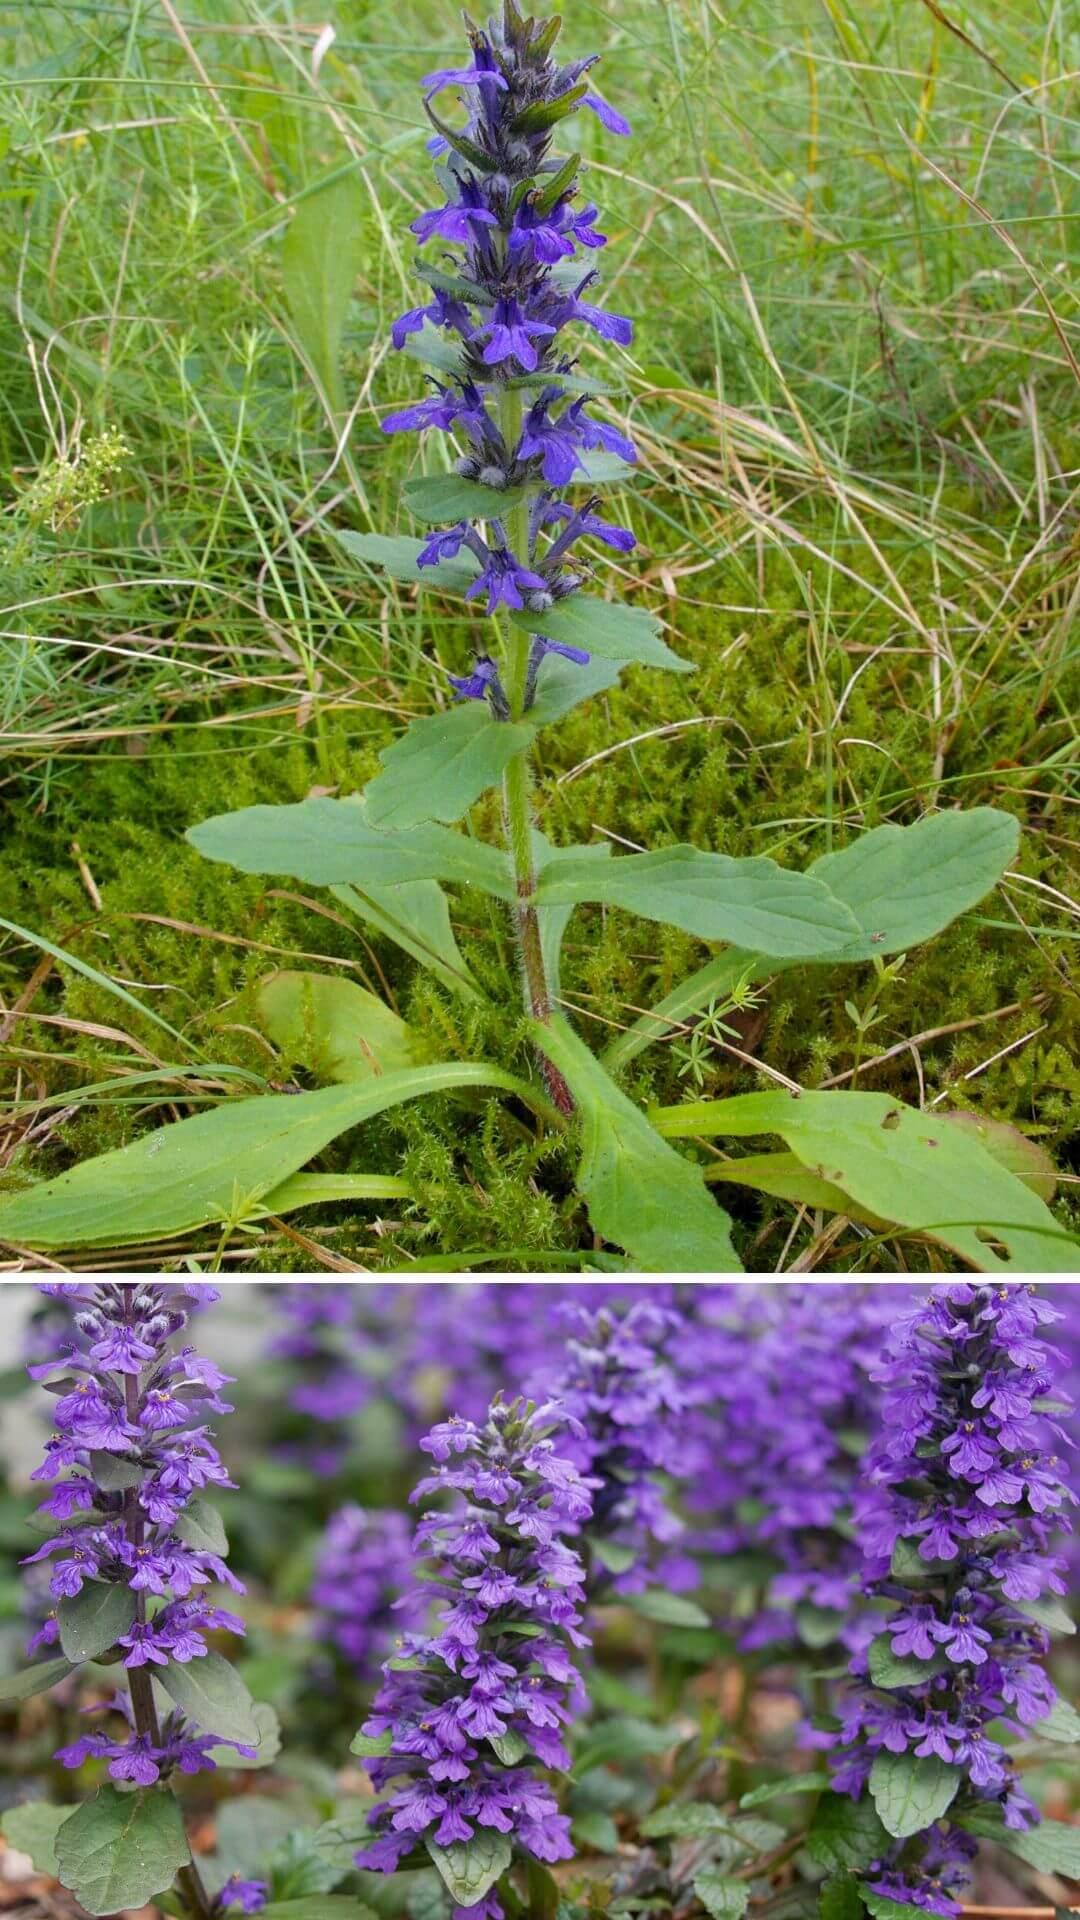 Ajuga (Bugleherb, bugleweed, carpetweed, carpet bugleweed) - Heat and Drought Tolerant Plants for Landscaping